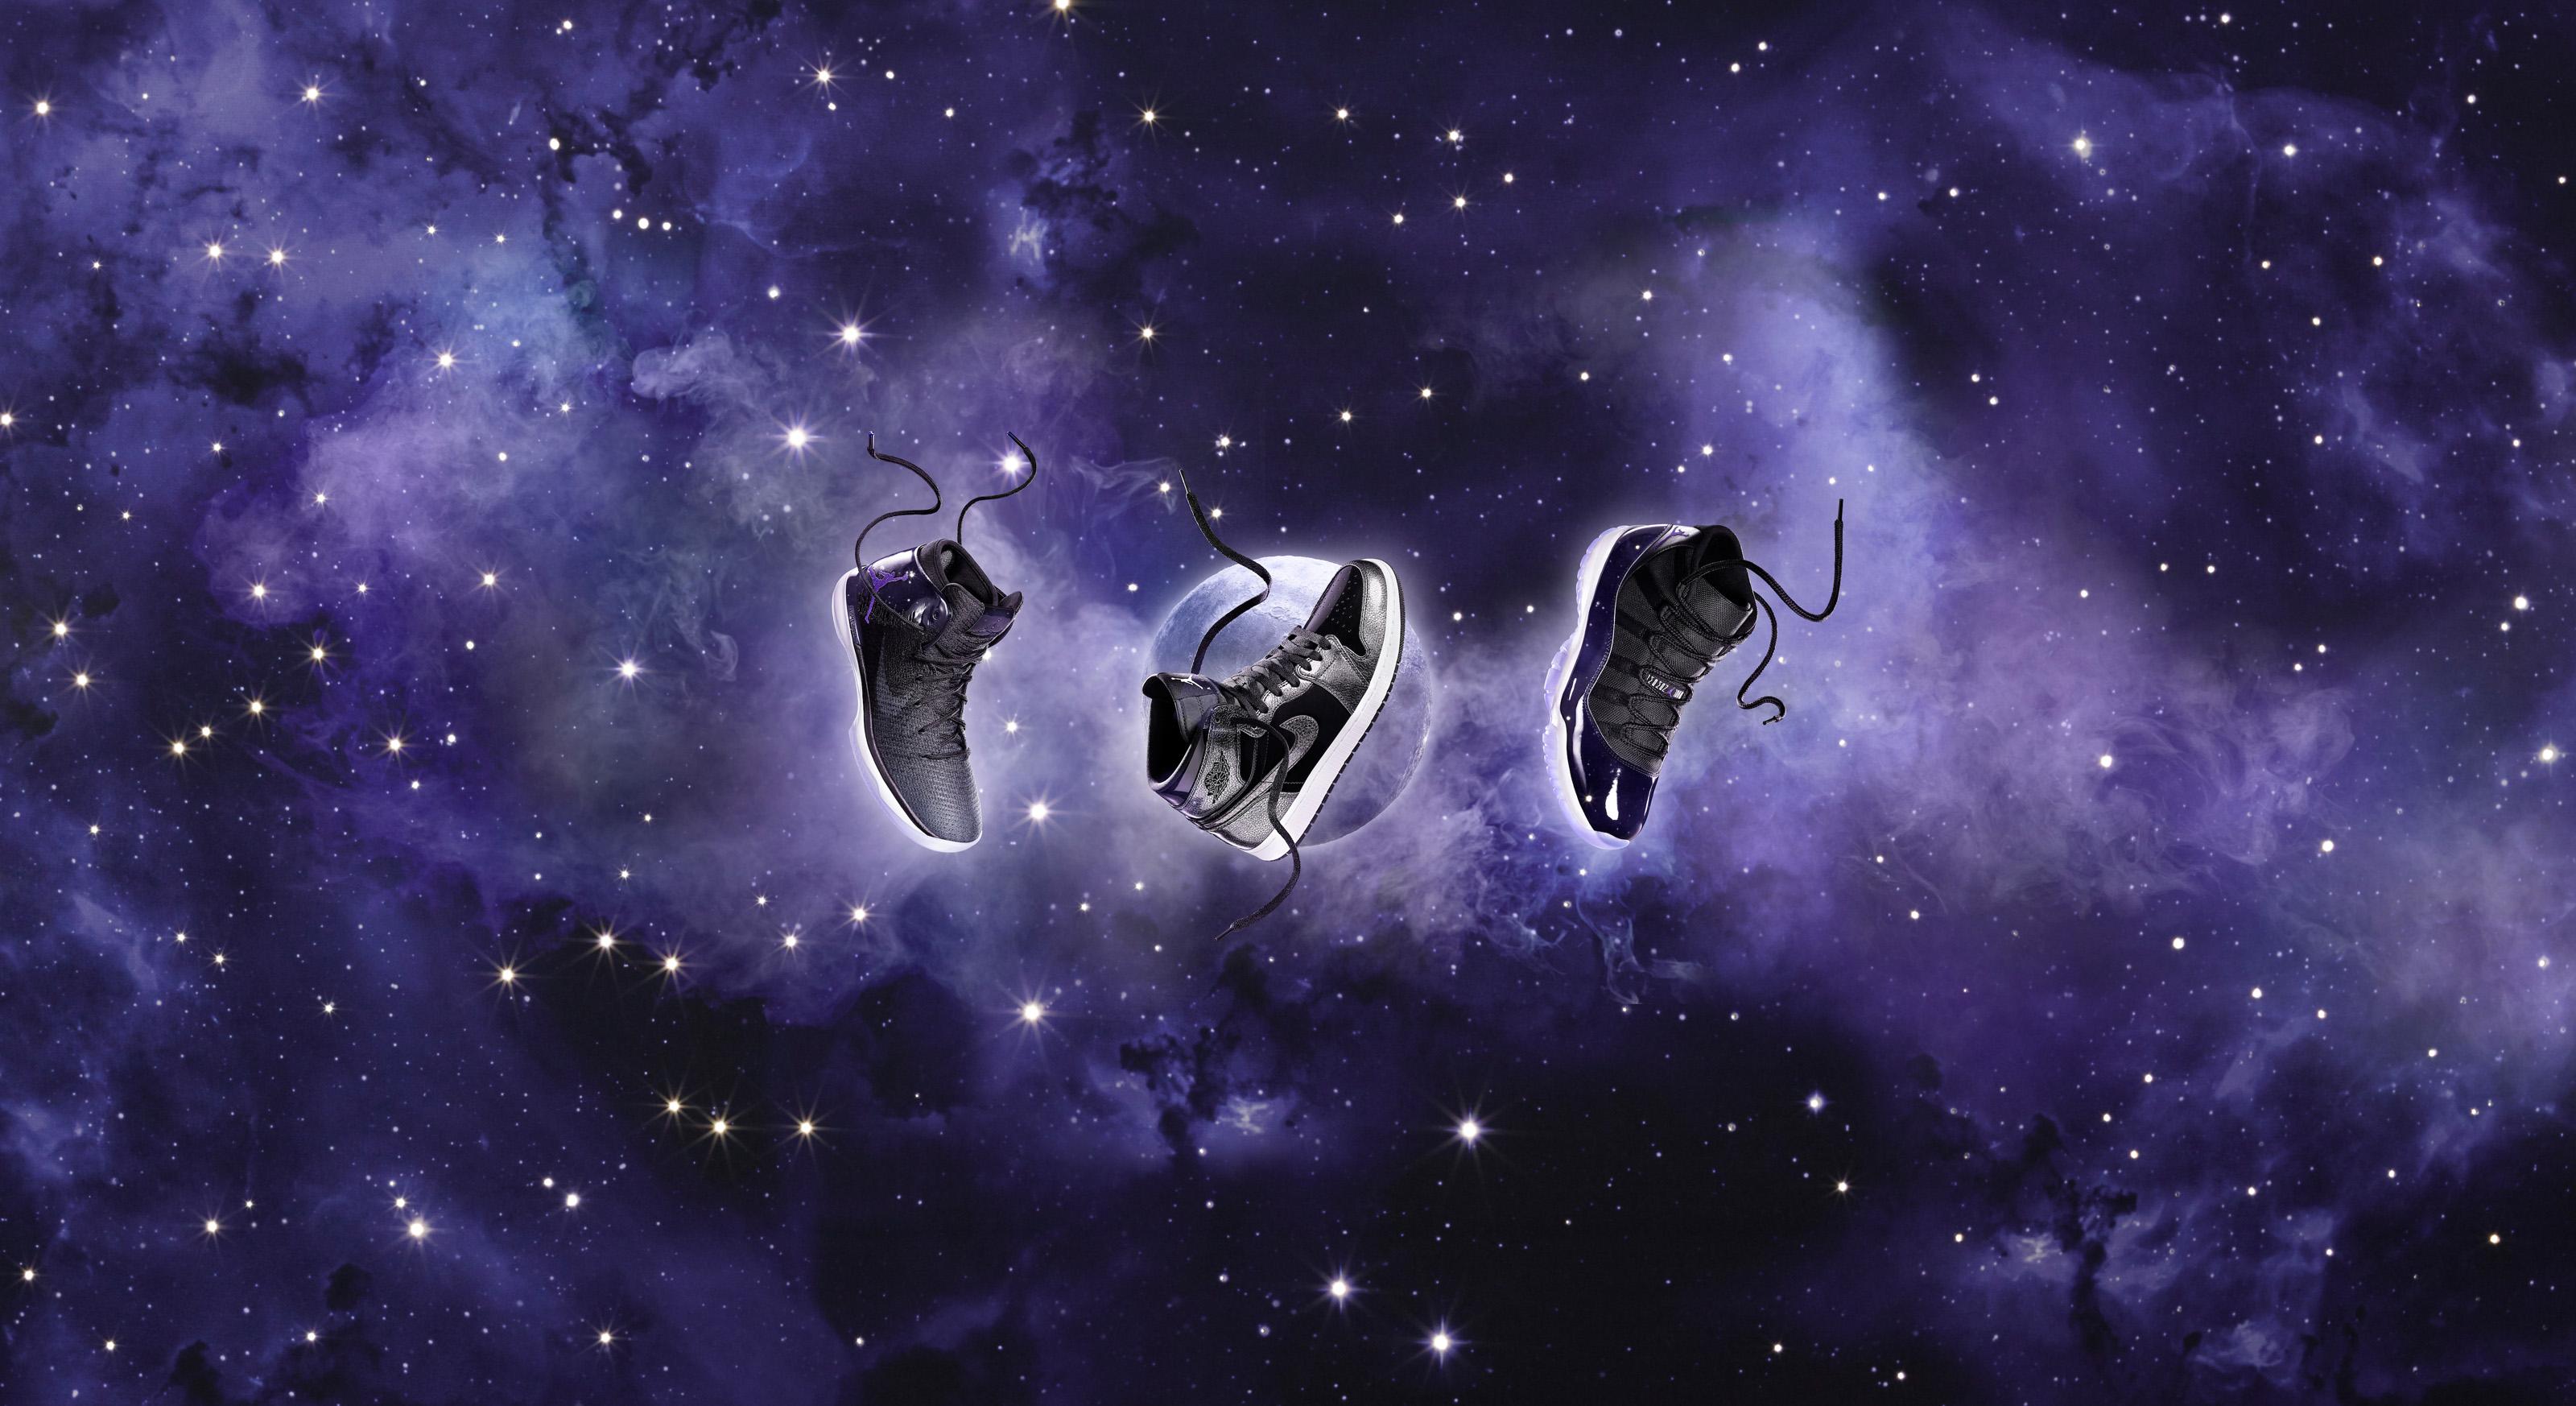 space_jam_footwear_original